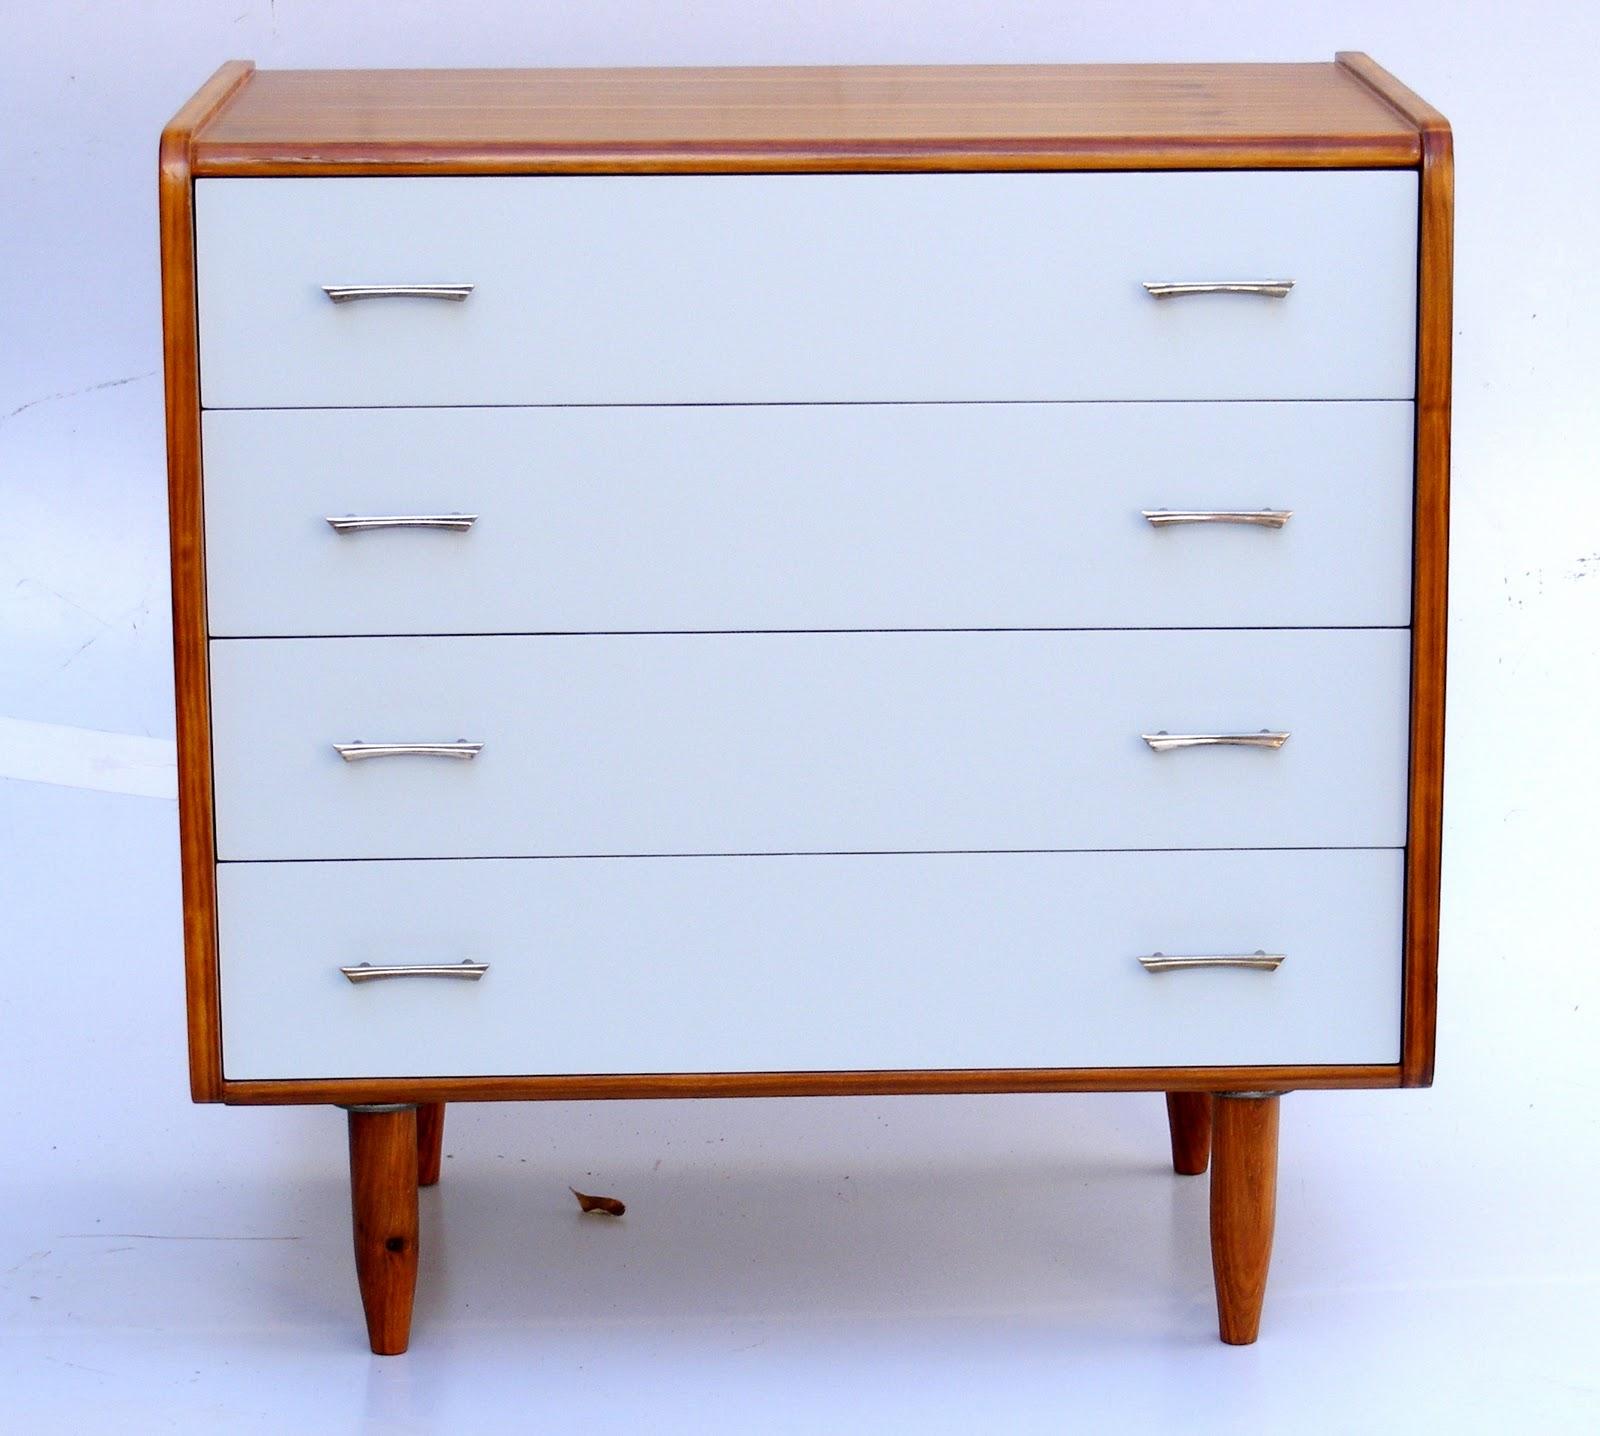 VAMP FURNITURE this weeks new furniture stock at Vamp